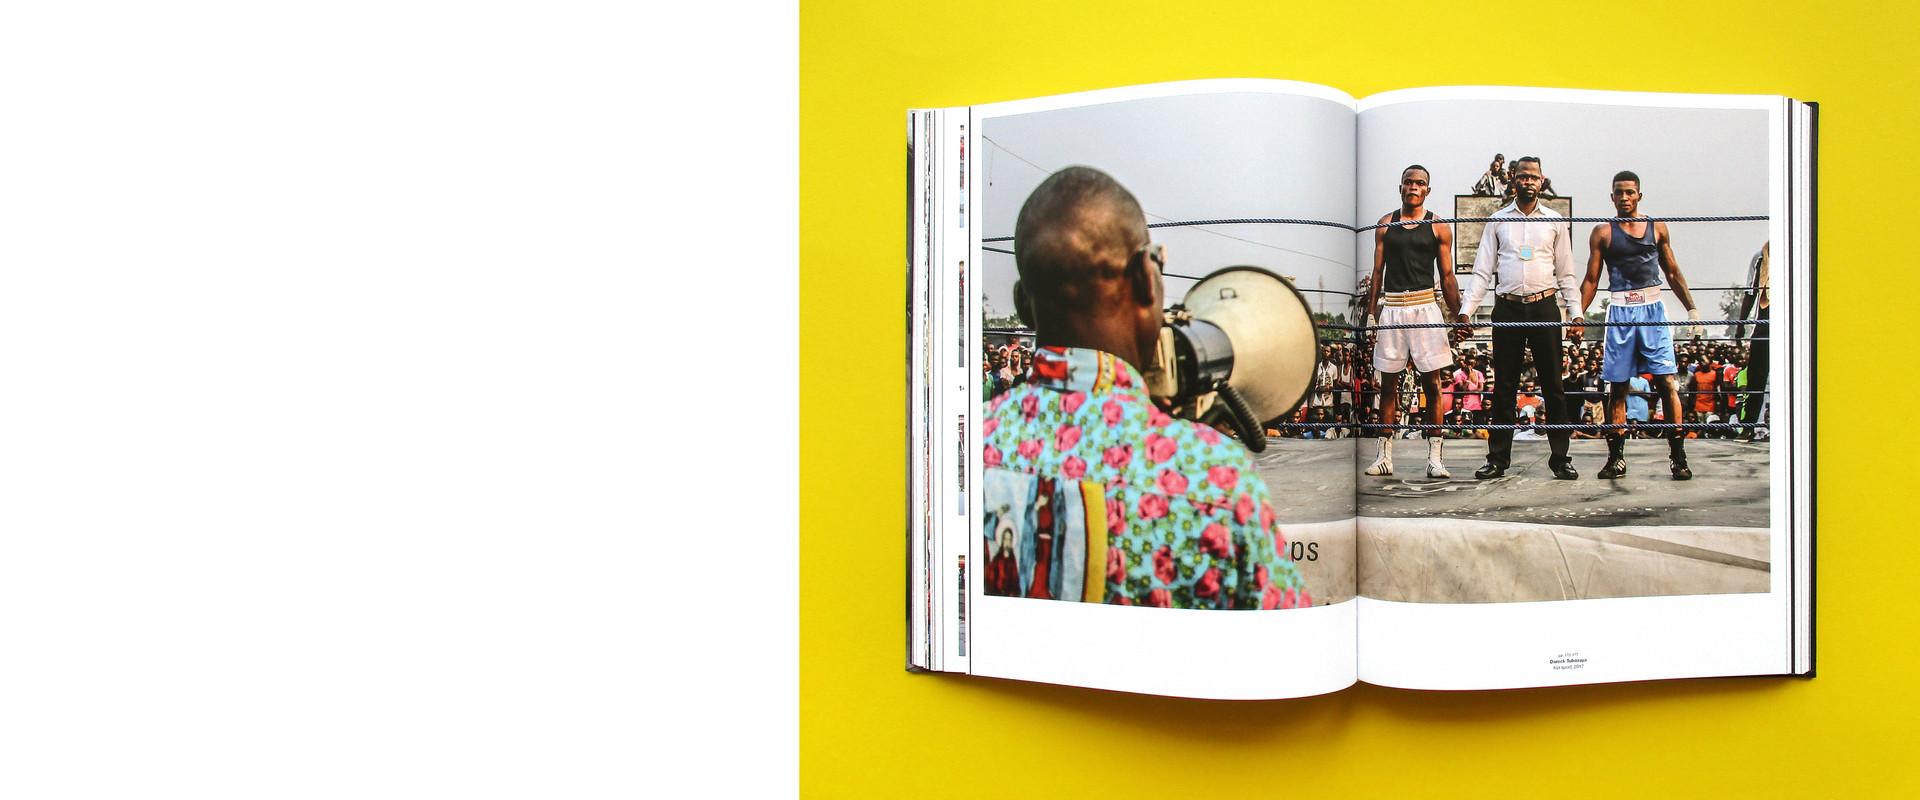 Kinshasa Chroniques_Galerie8.jpg